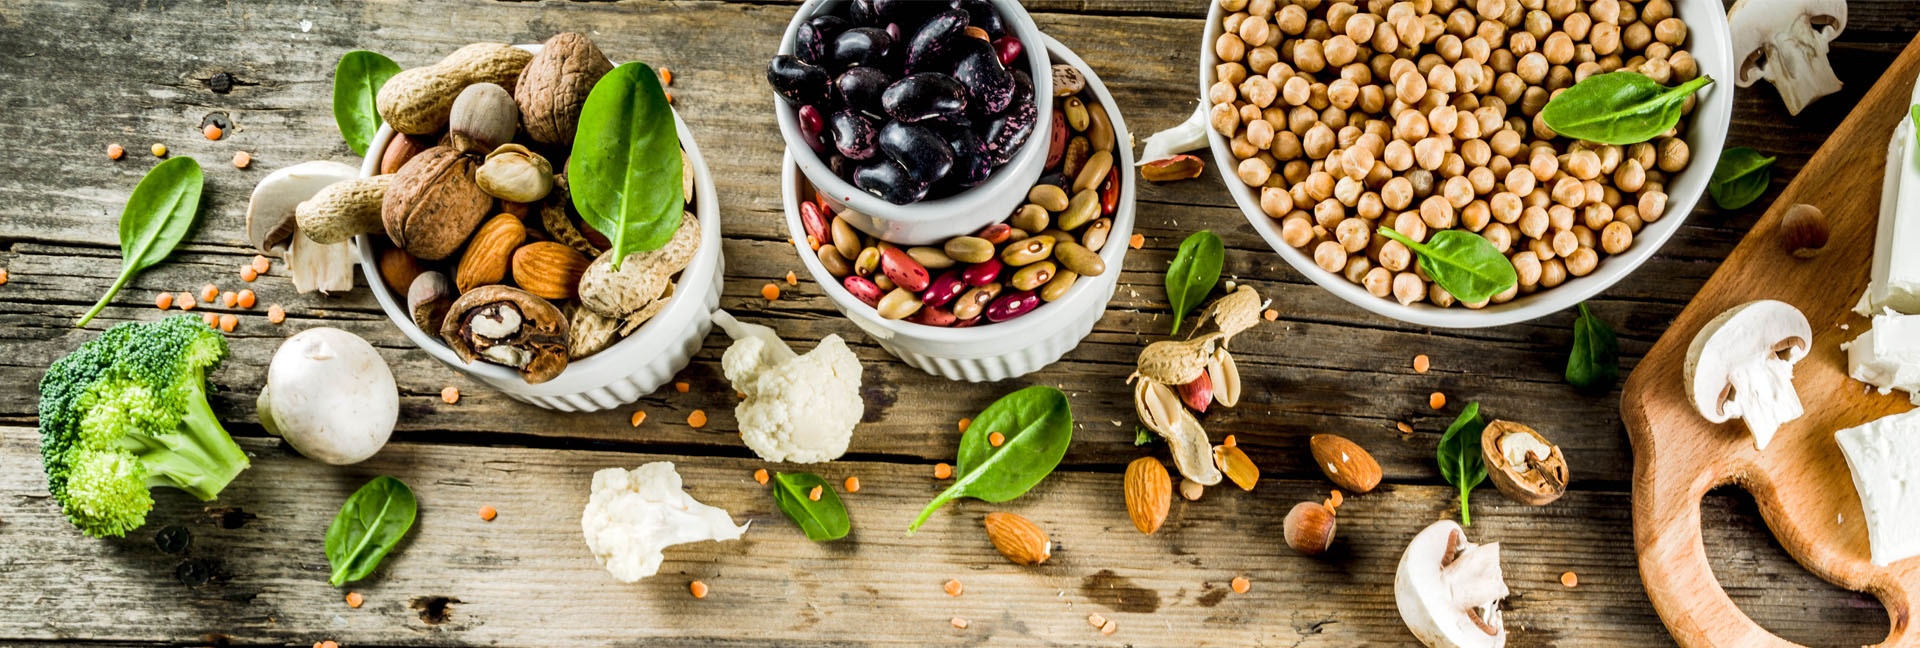 Ernährungsberatung - Vegetarische Ernährung, Pilze, Bohnen, Nüsse, Tofu, Gemüse, Kichererbsen